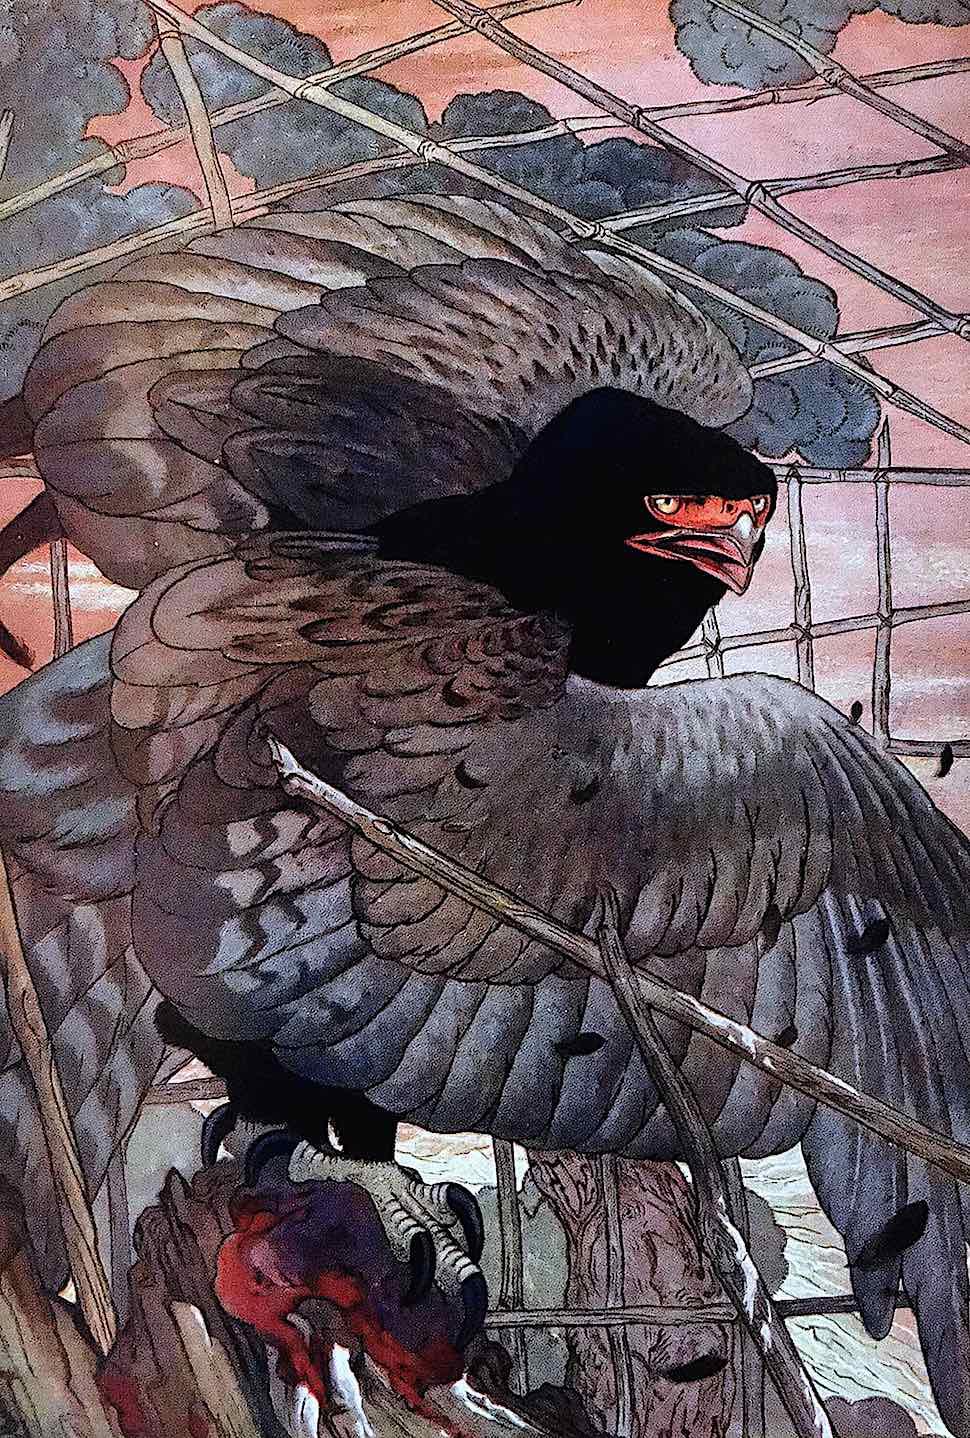 an E.J. Detmold illustration of a trapped hawk